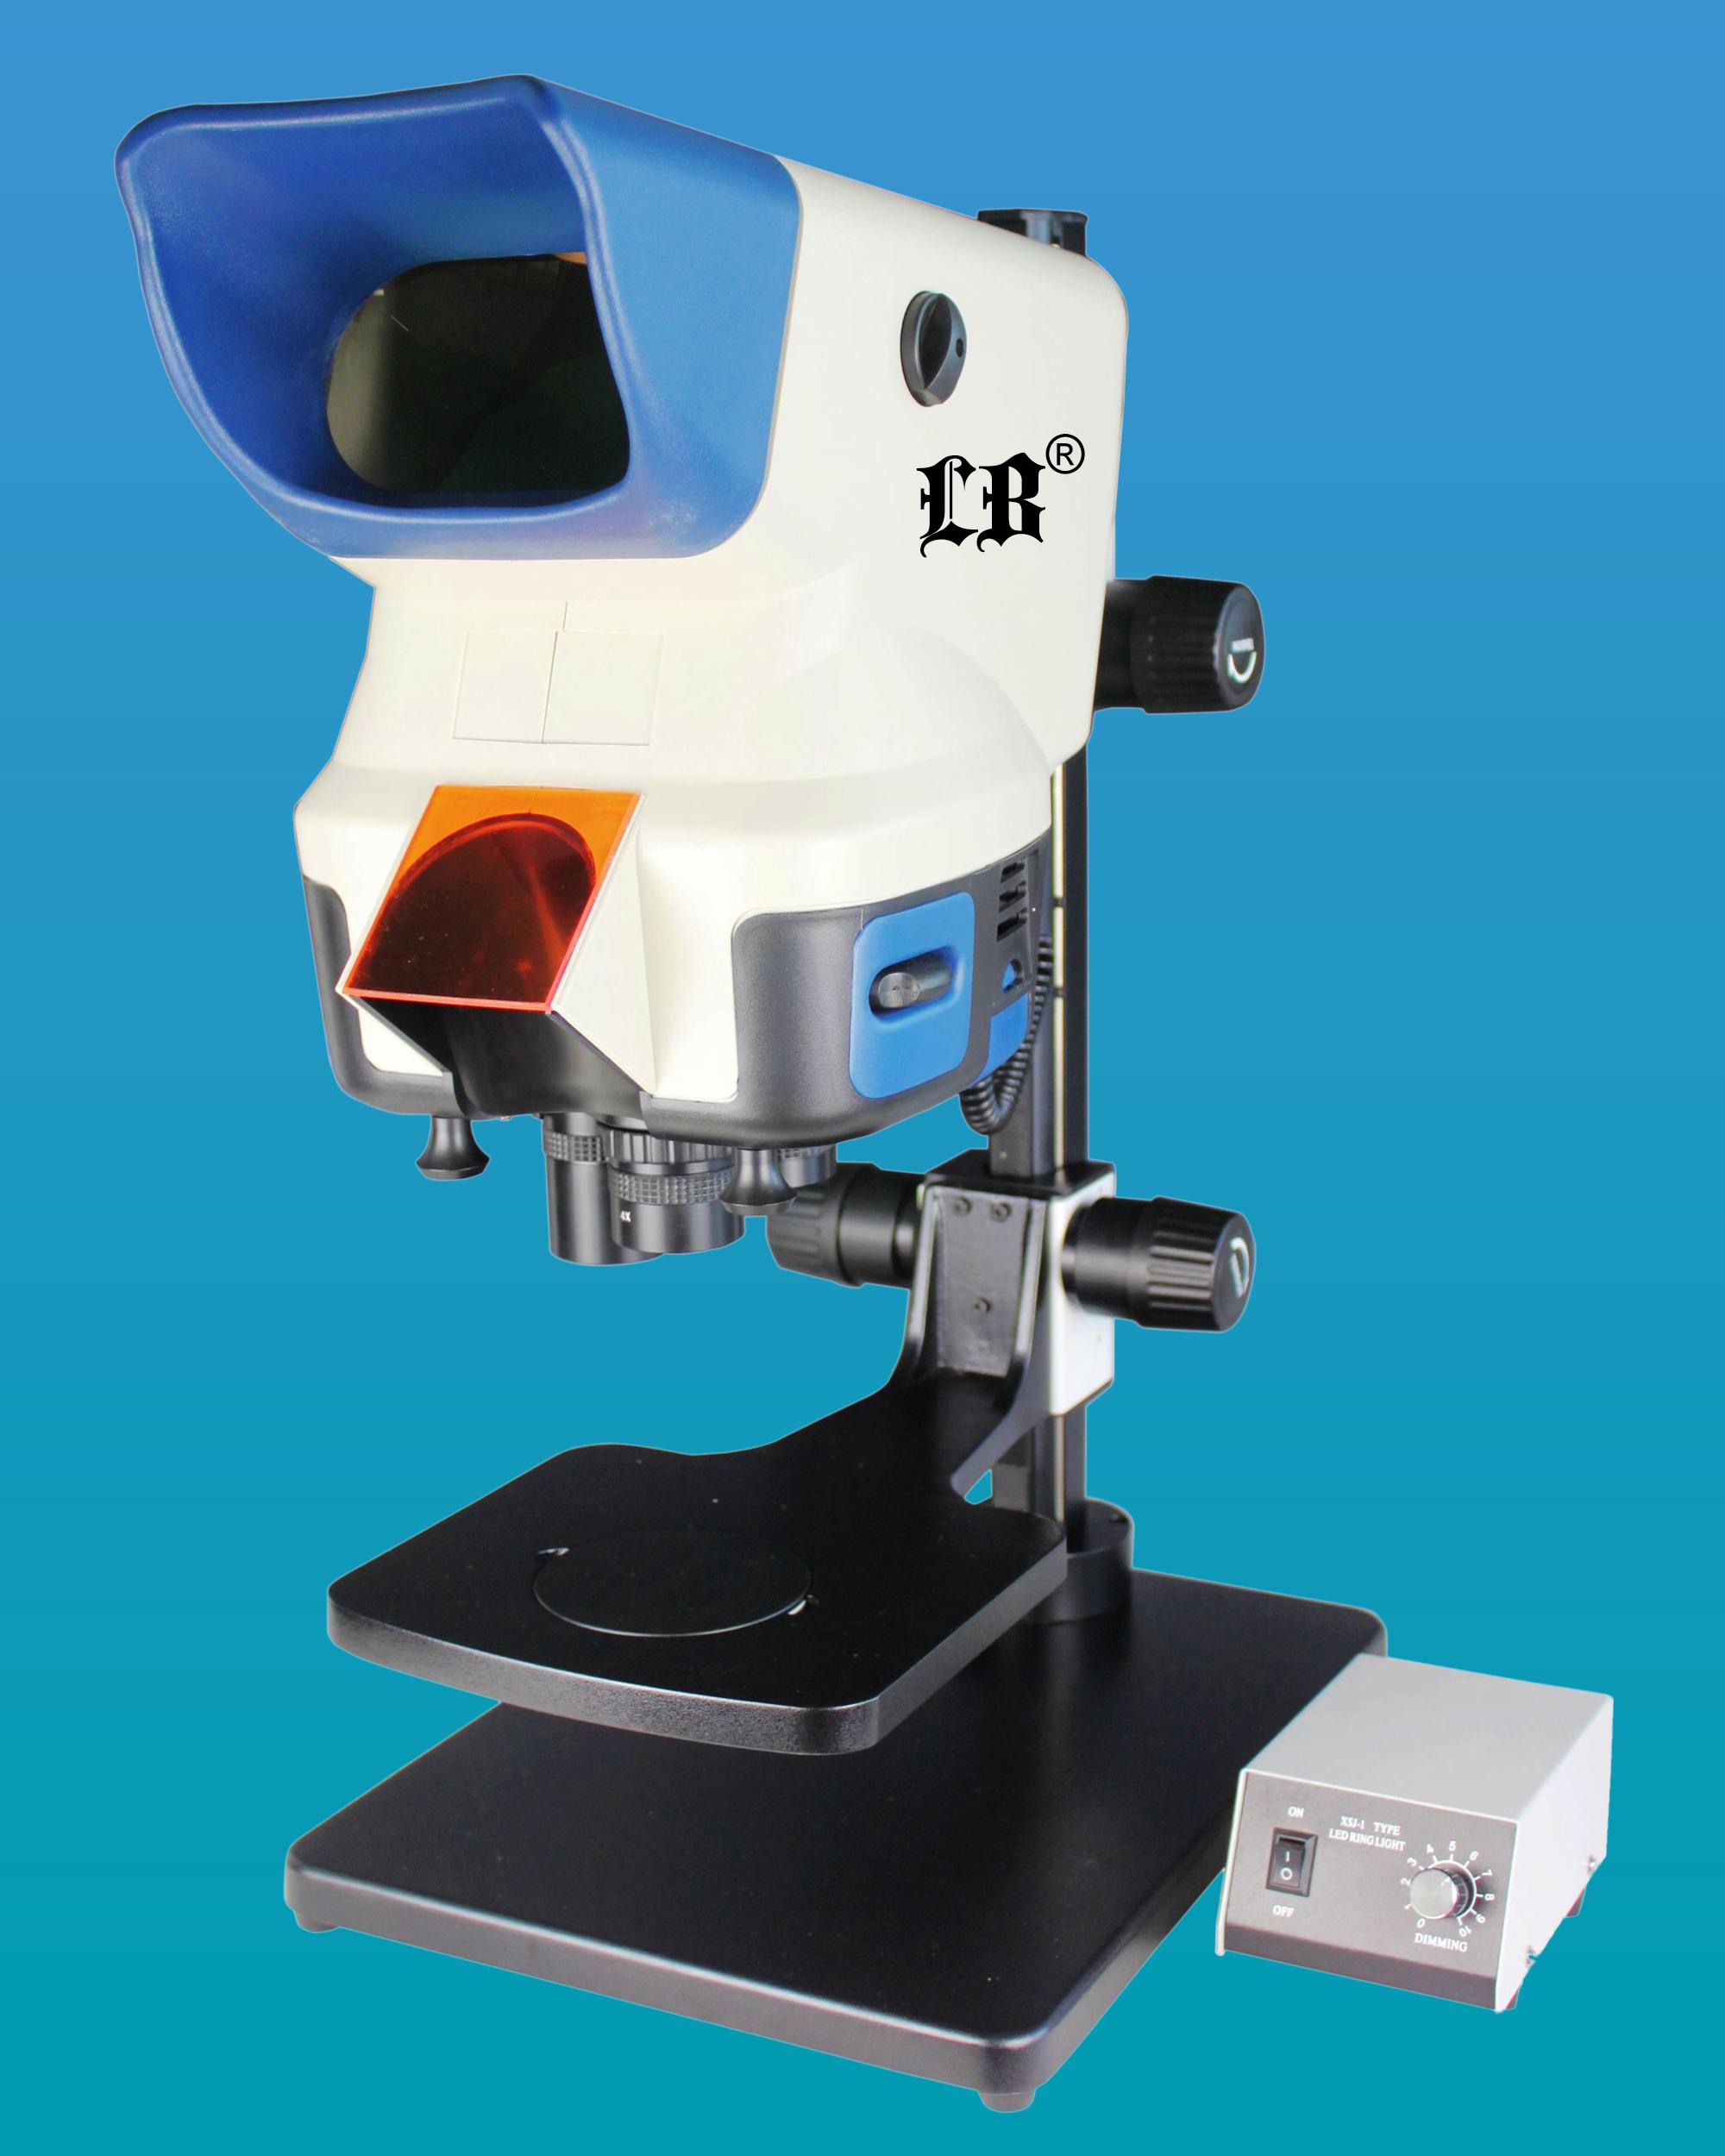 [LB-371] Wide Field Digital Zoom Stereo Microscope w/ Adjustable Stage